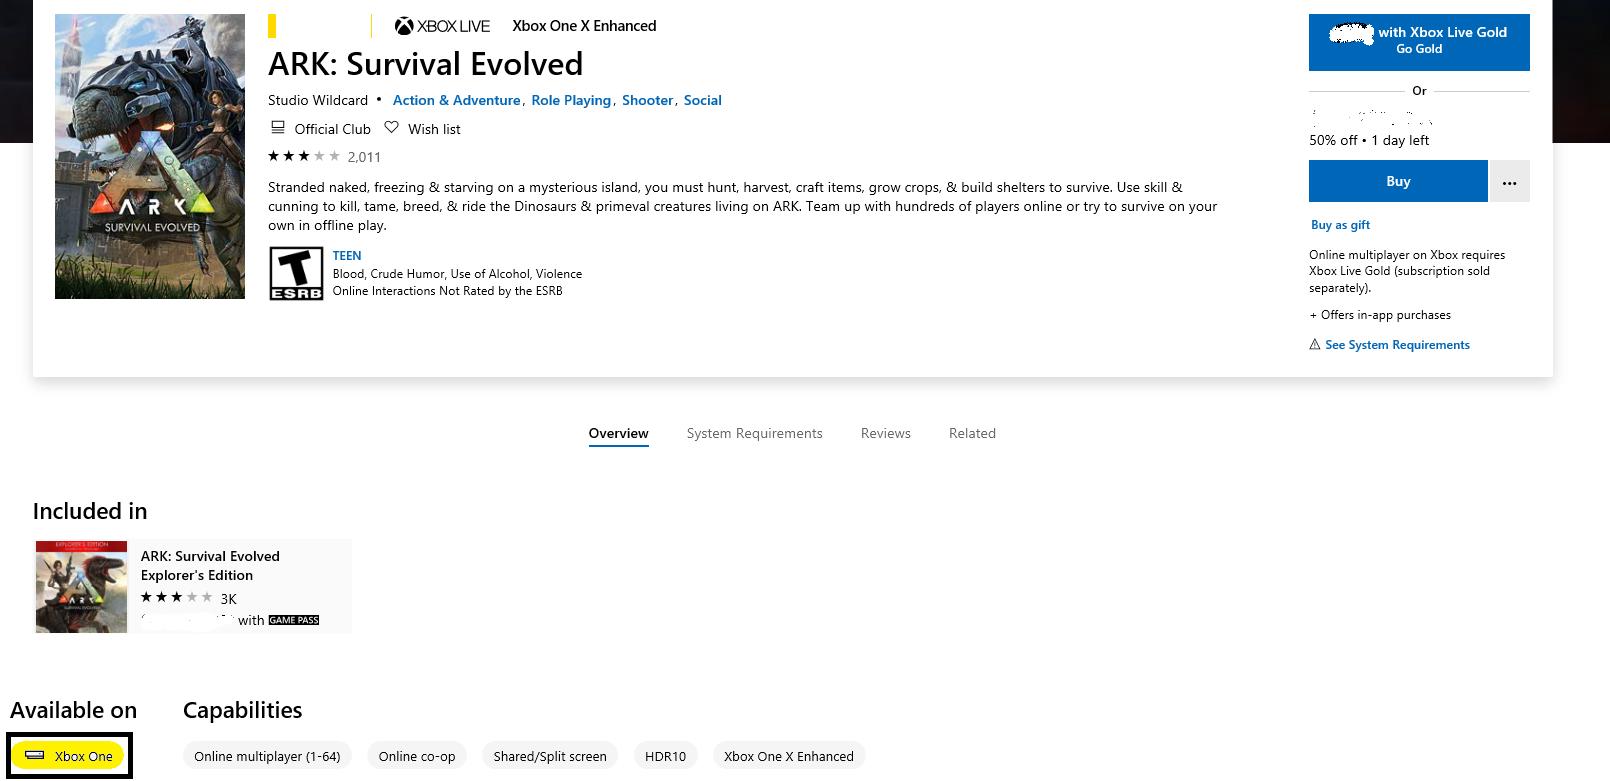 Ark Survival Evolved 3f3e8035-d45a-4794-8581-6ba2c23f8874?upload=true.png